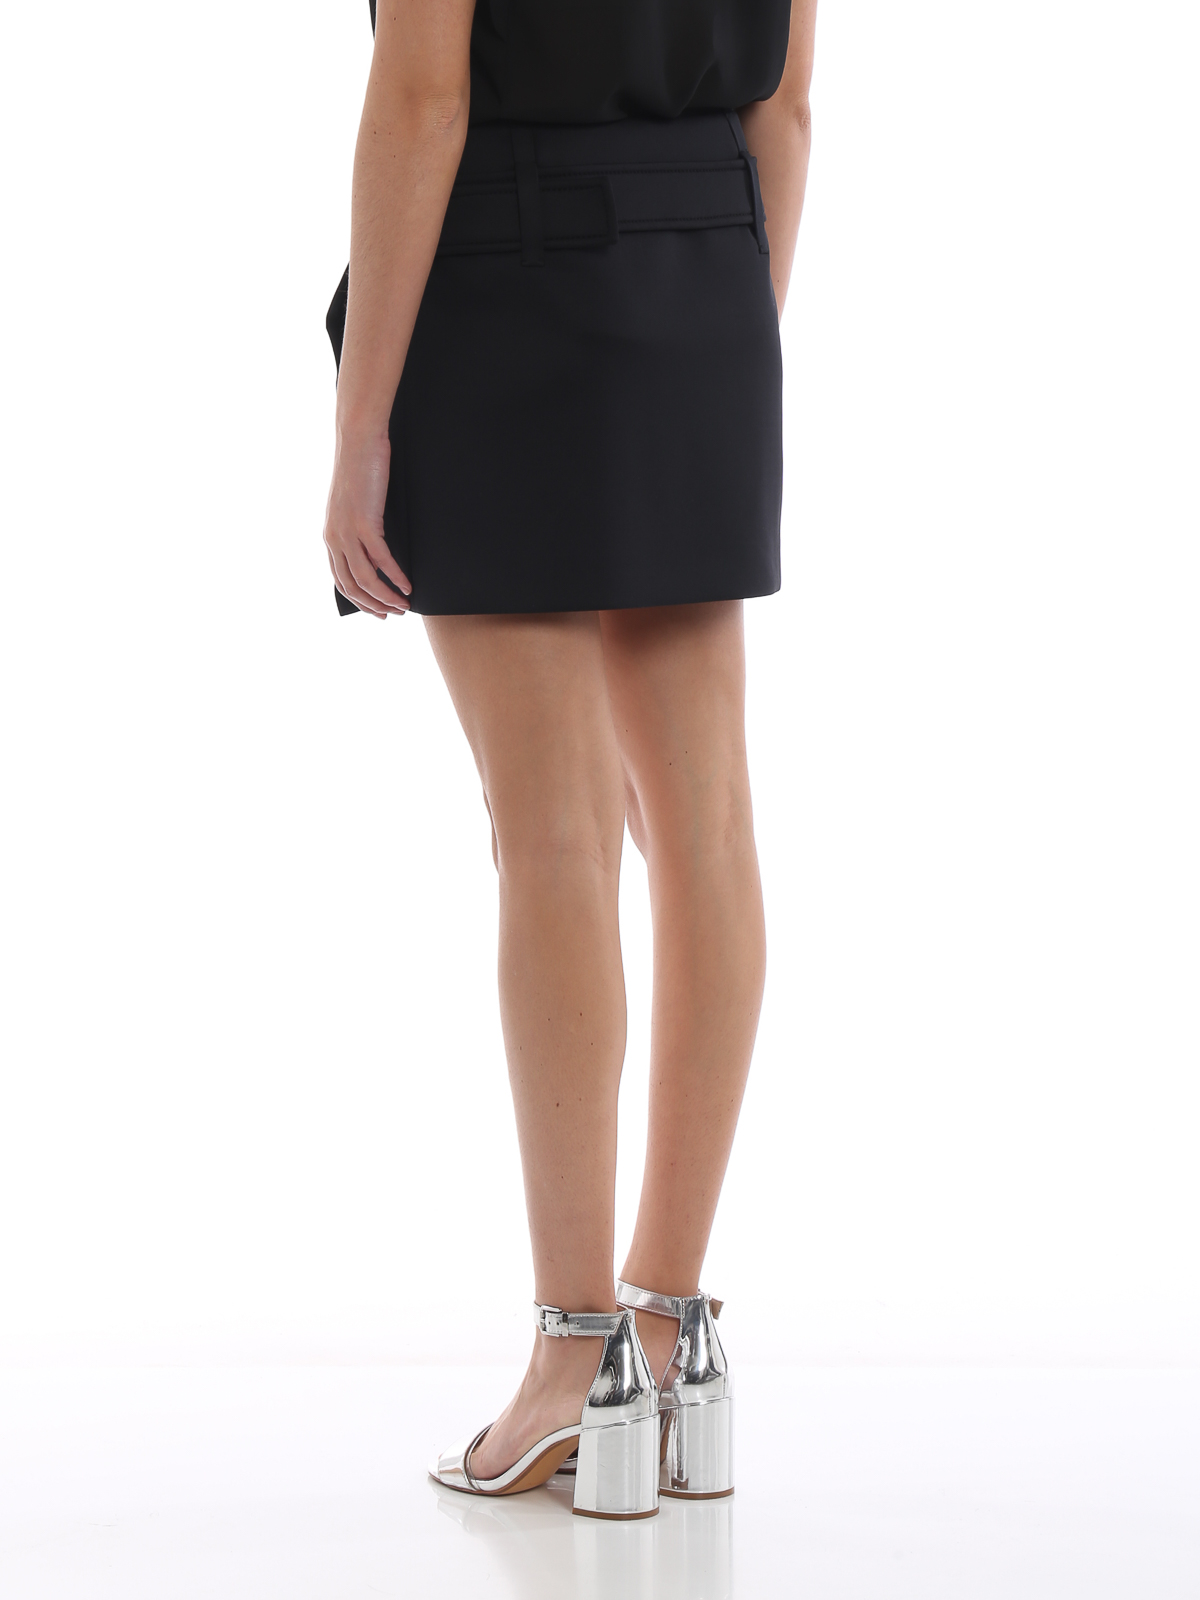 ab4e3b833 Prada - Black tech jersey belted mini skirt - mini skirts - P157OH ...